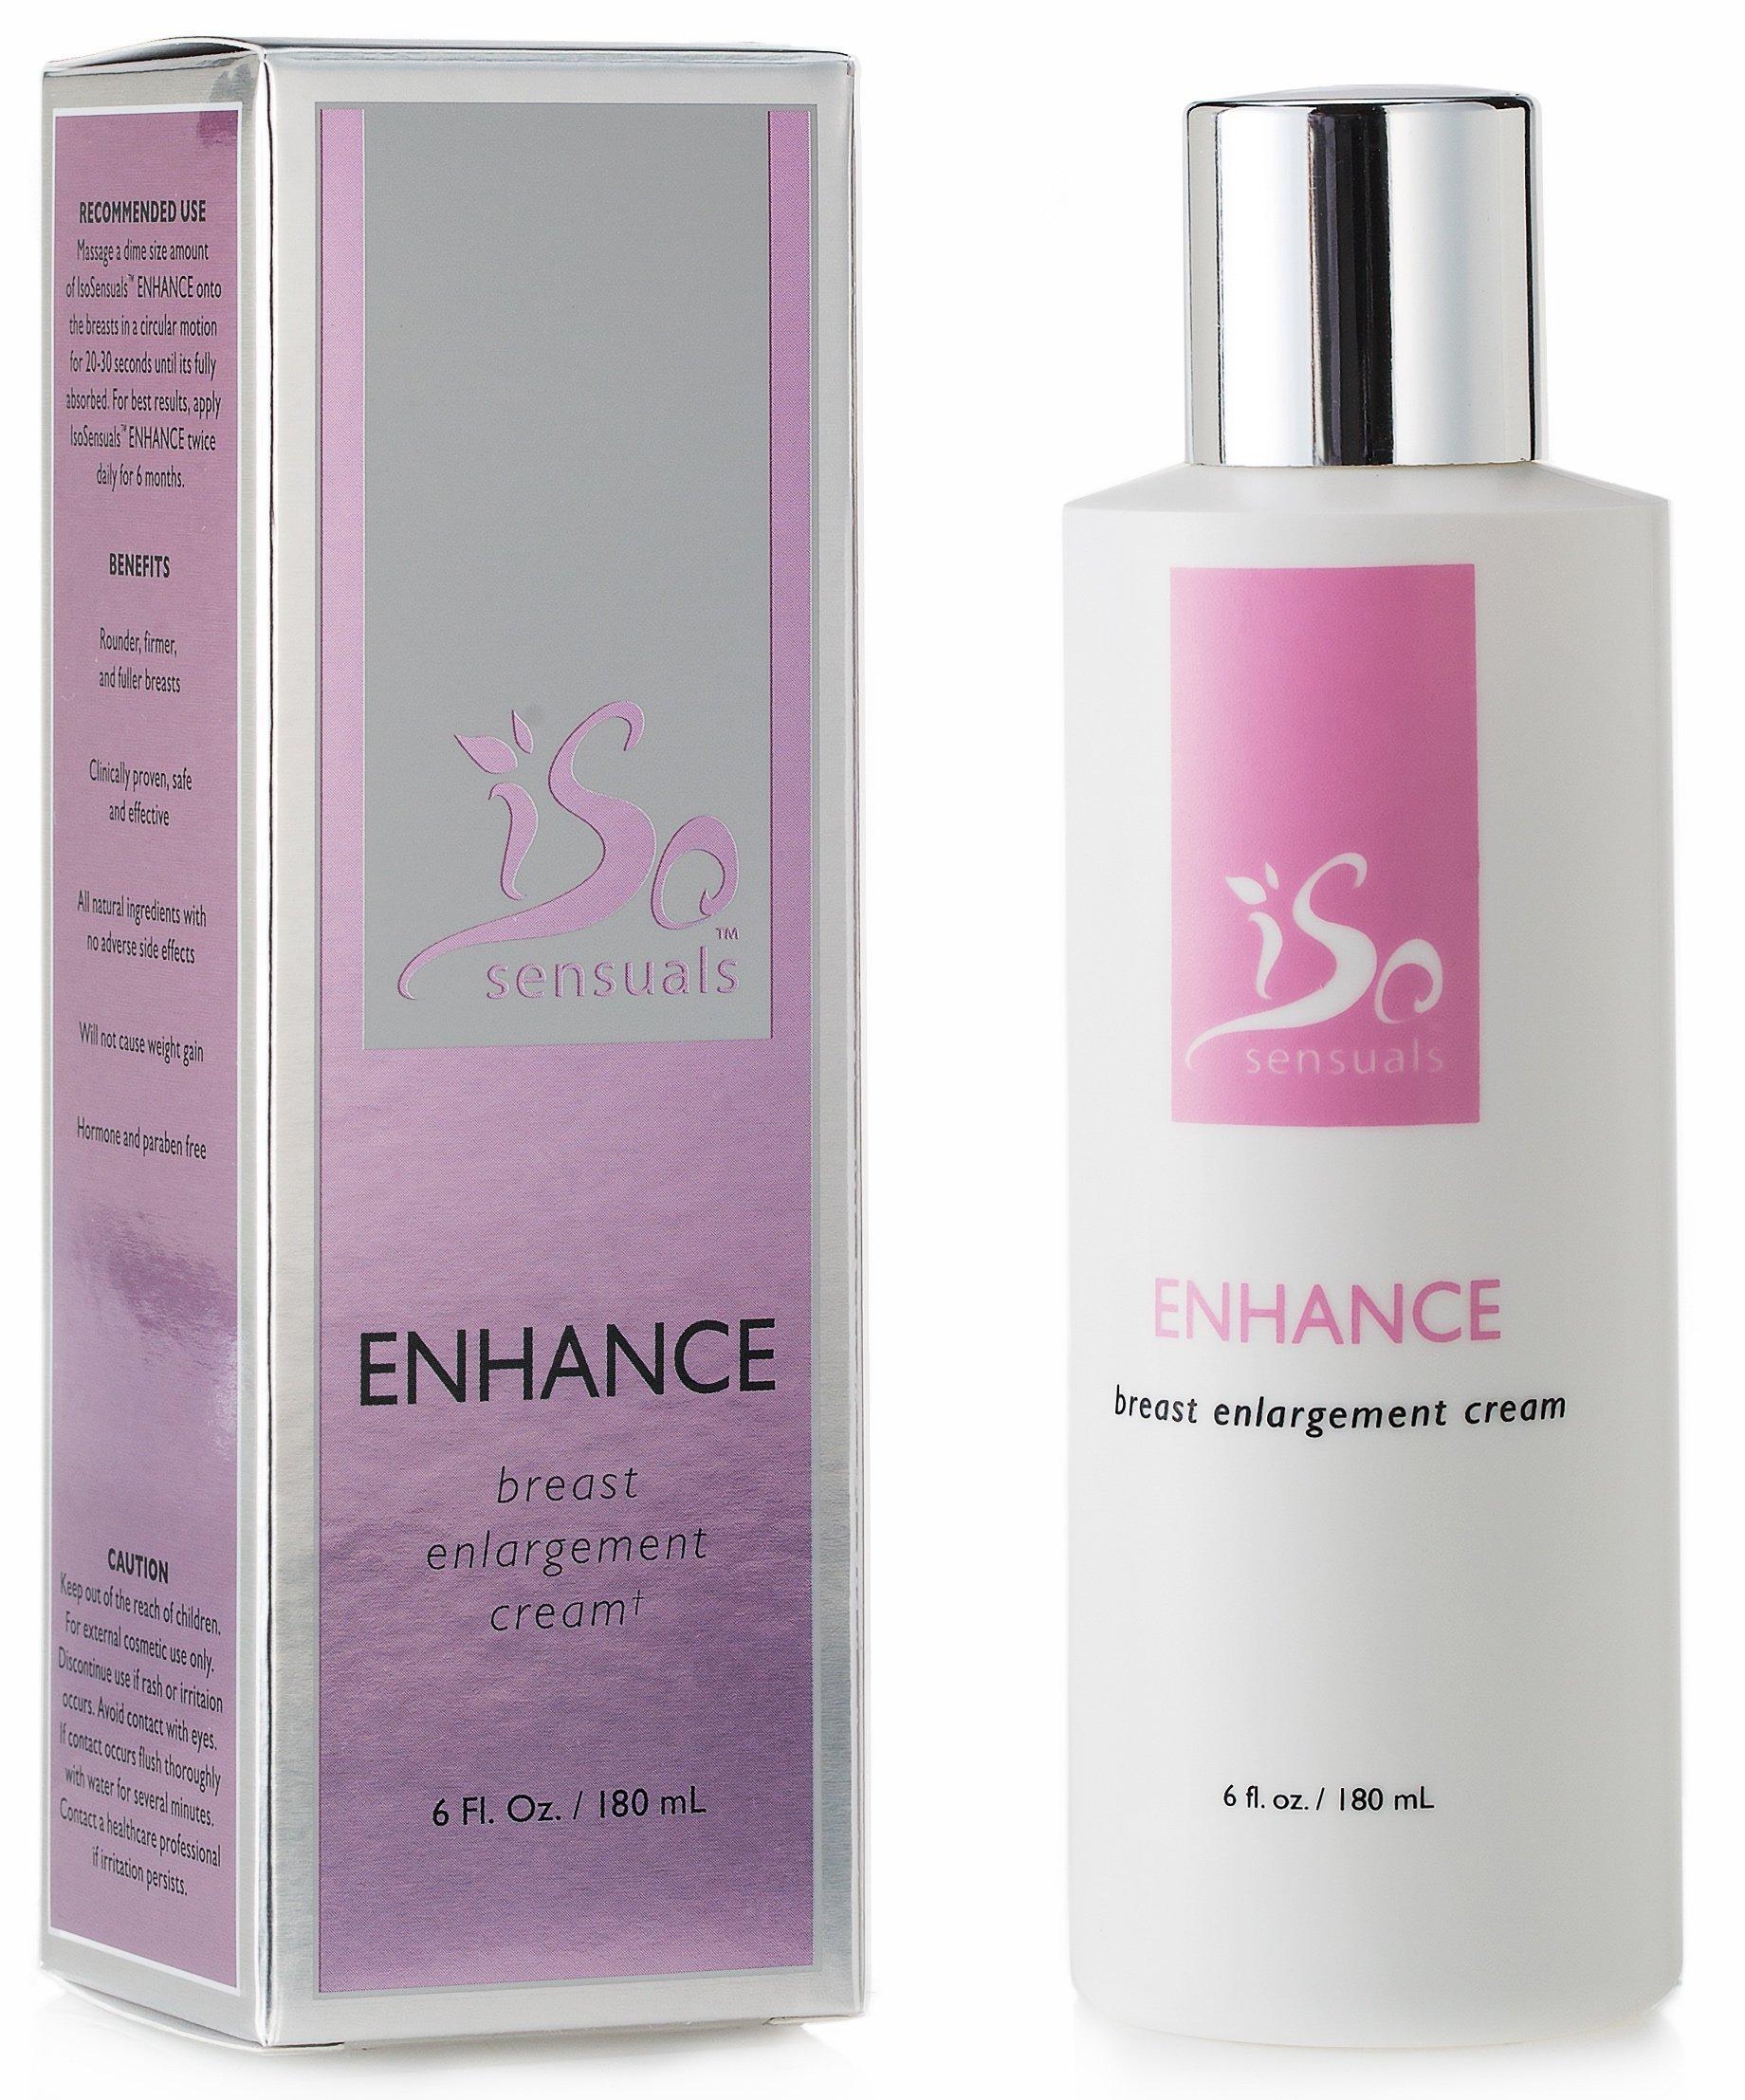 IsoSensuals ENHANCE Breast Enlargement Cream